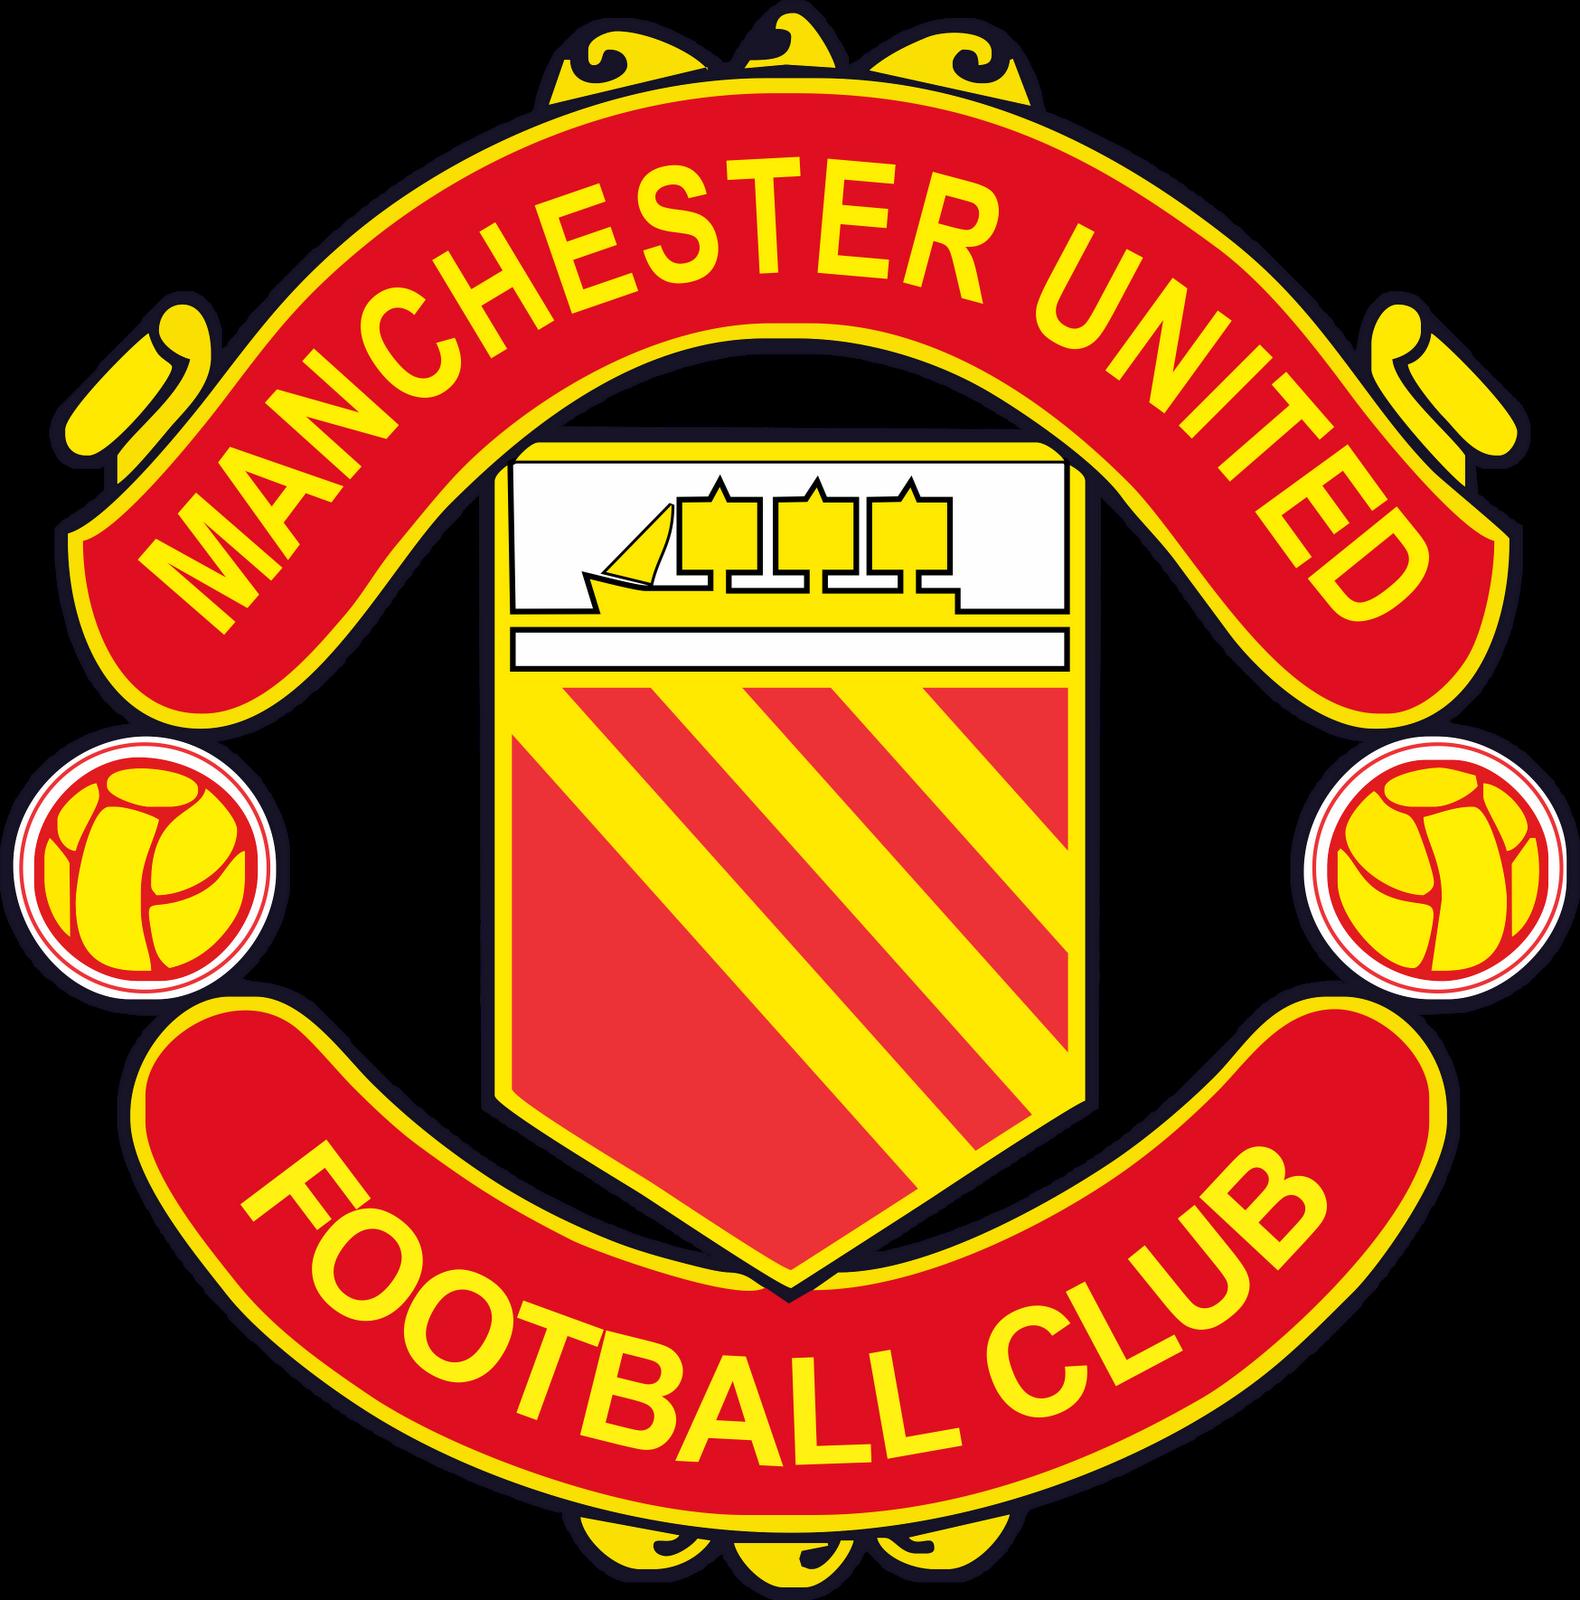 FH Logo: Manchester United FC